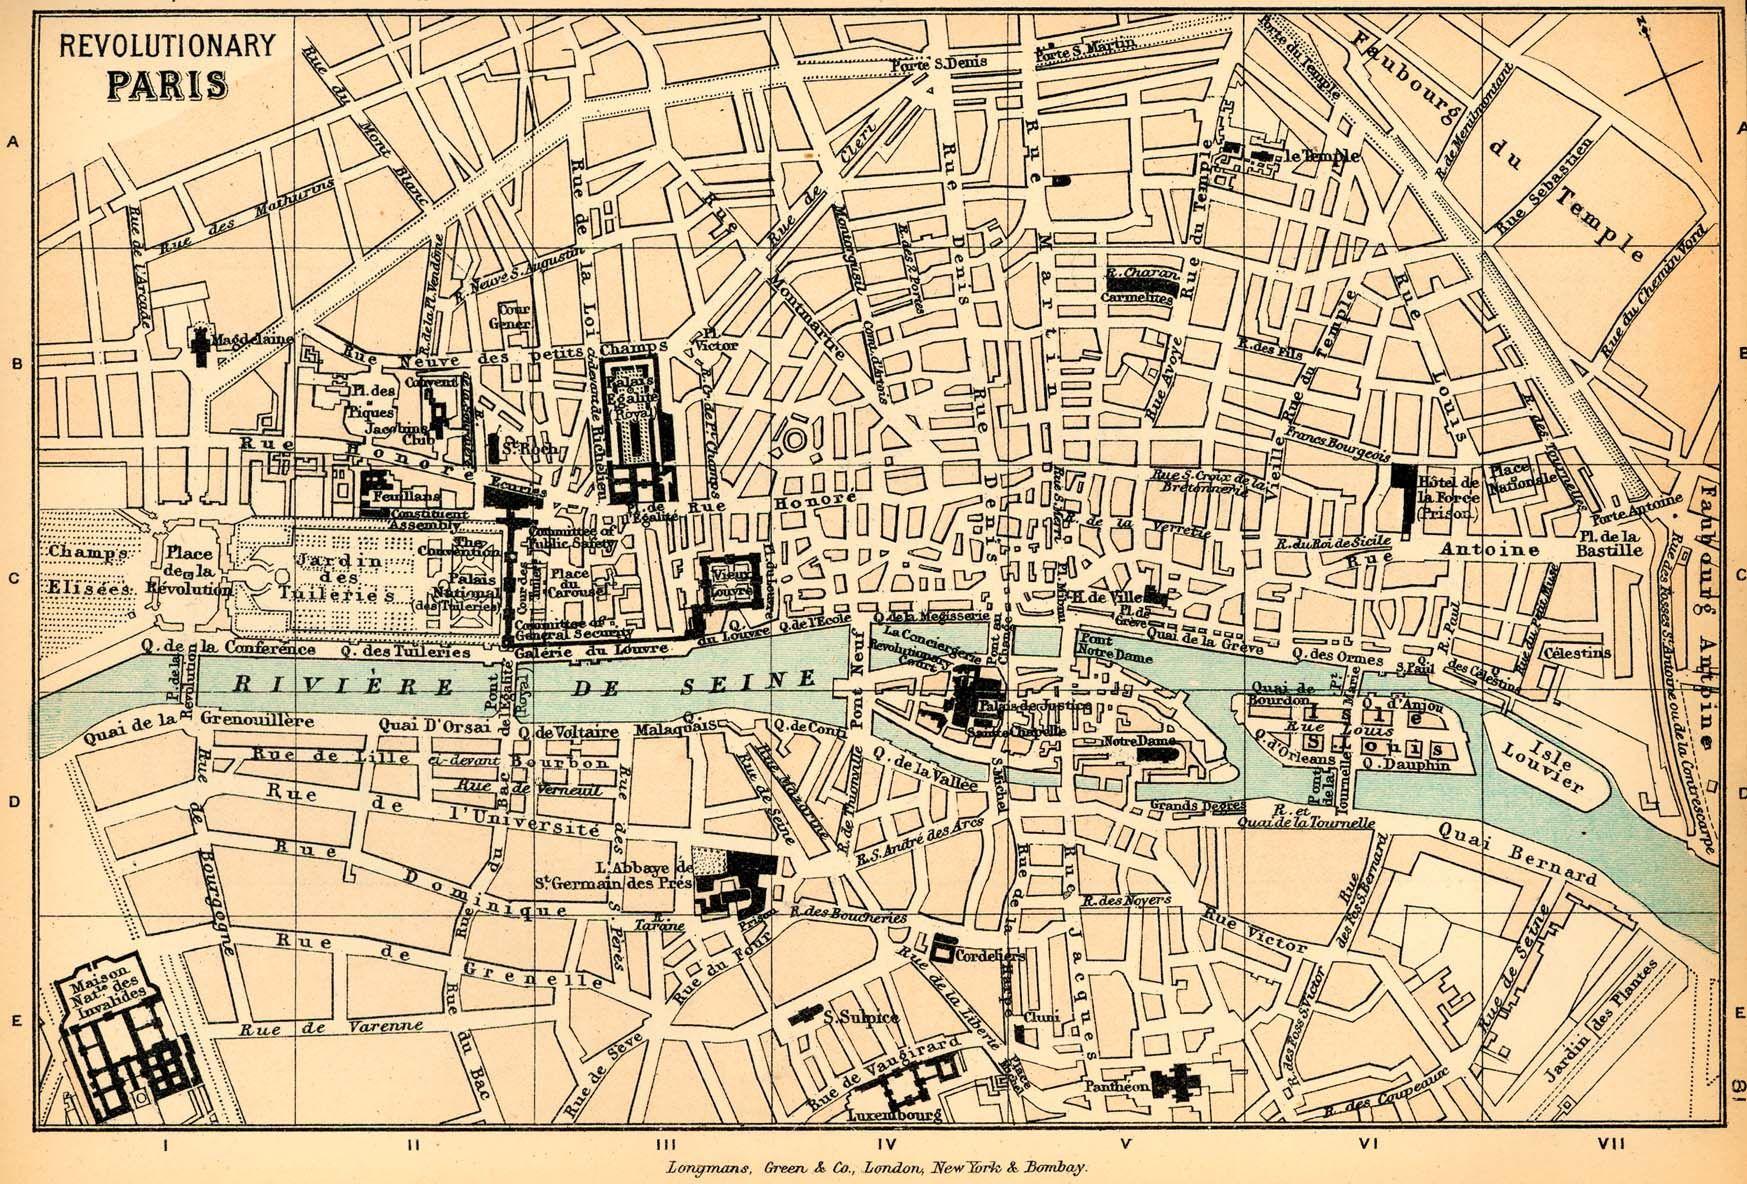 Street Maps of Paris France | Mapping Revolutionary Paris: 18th ...